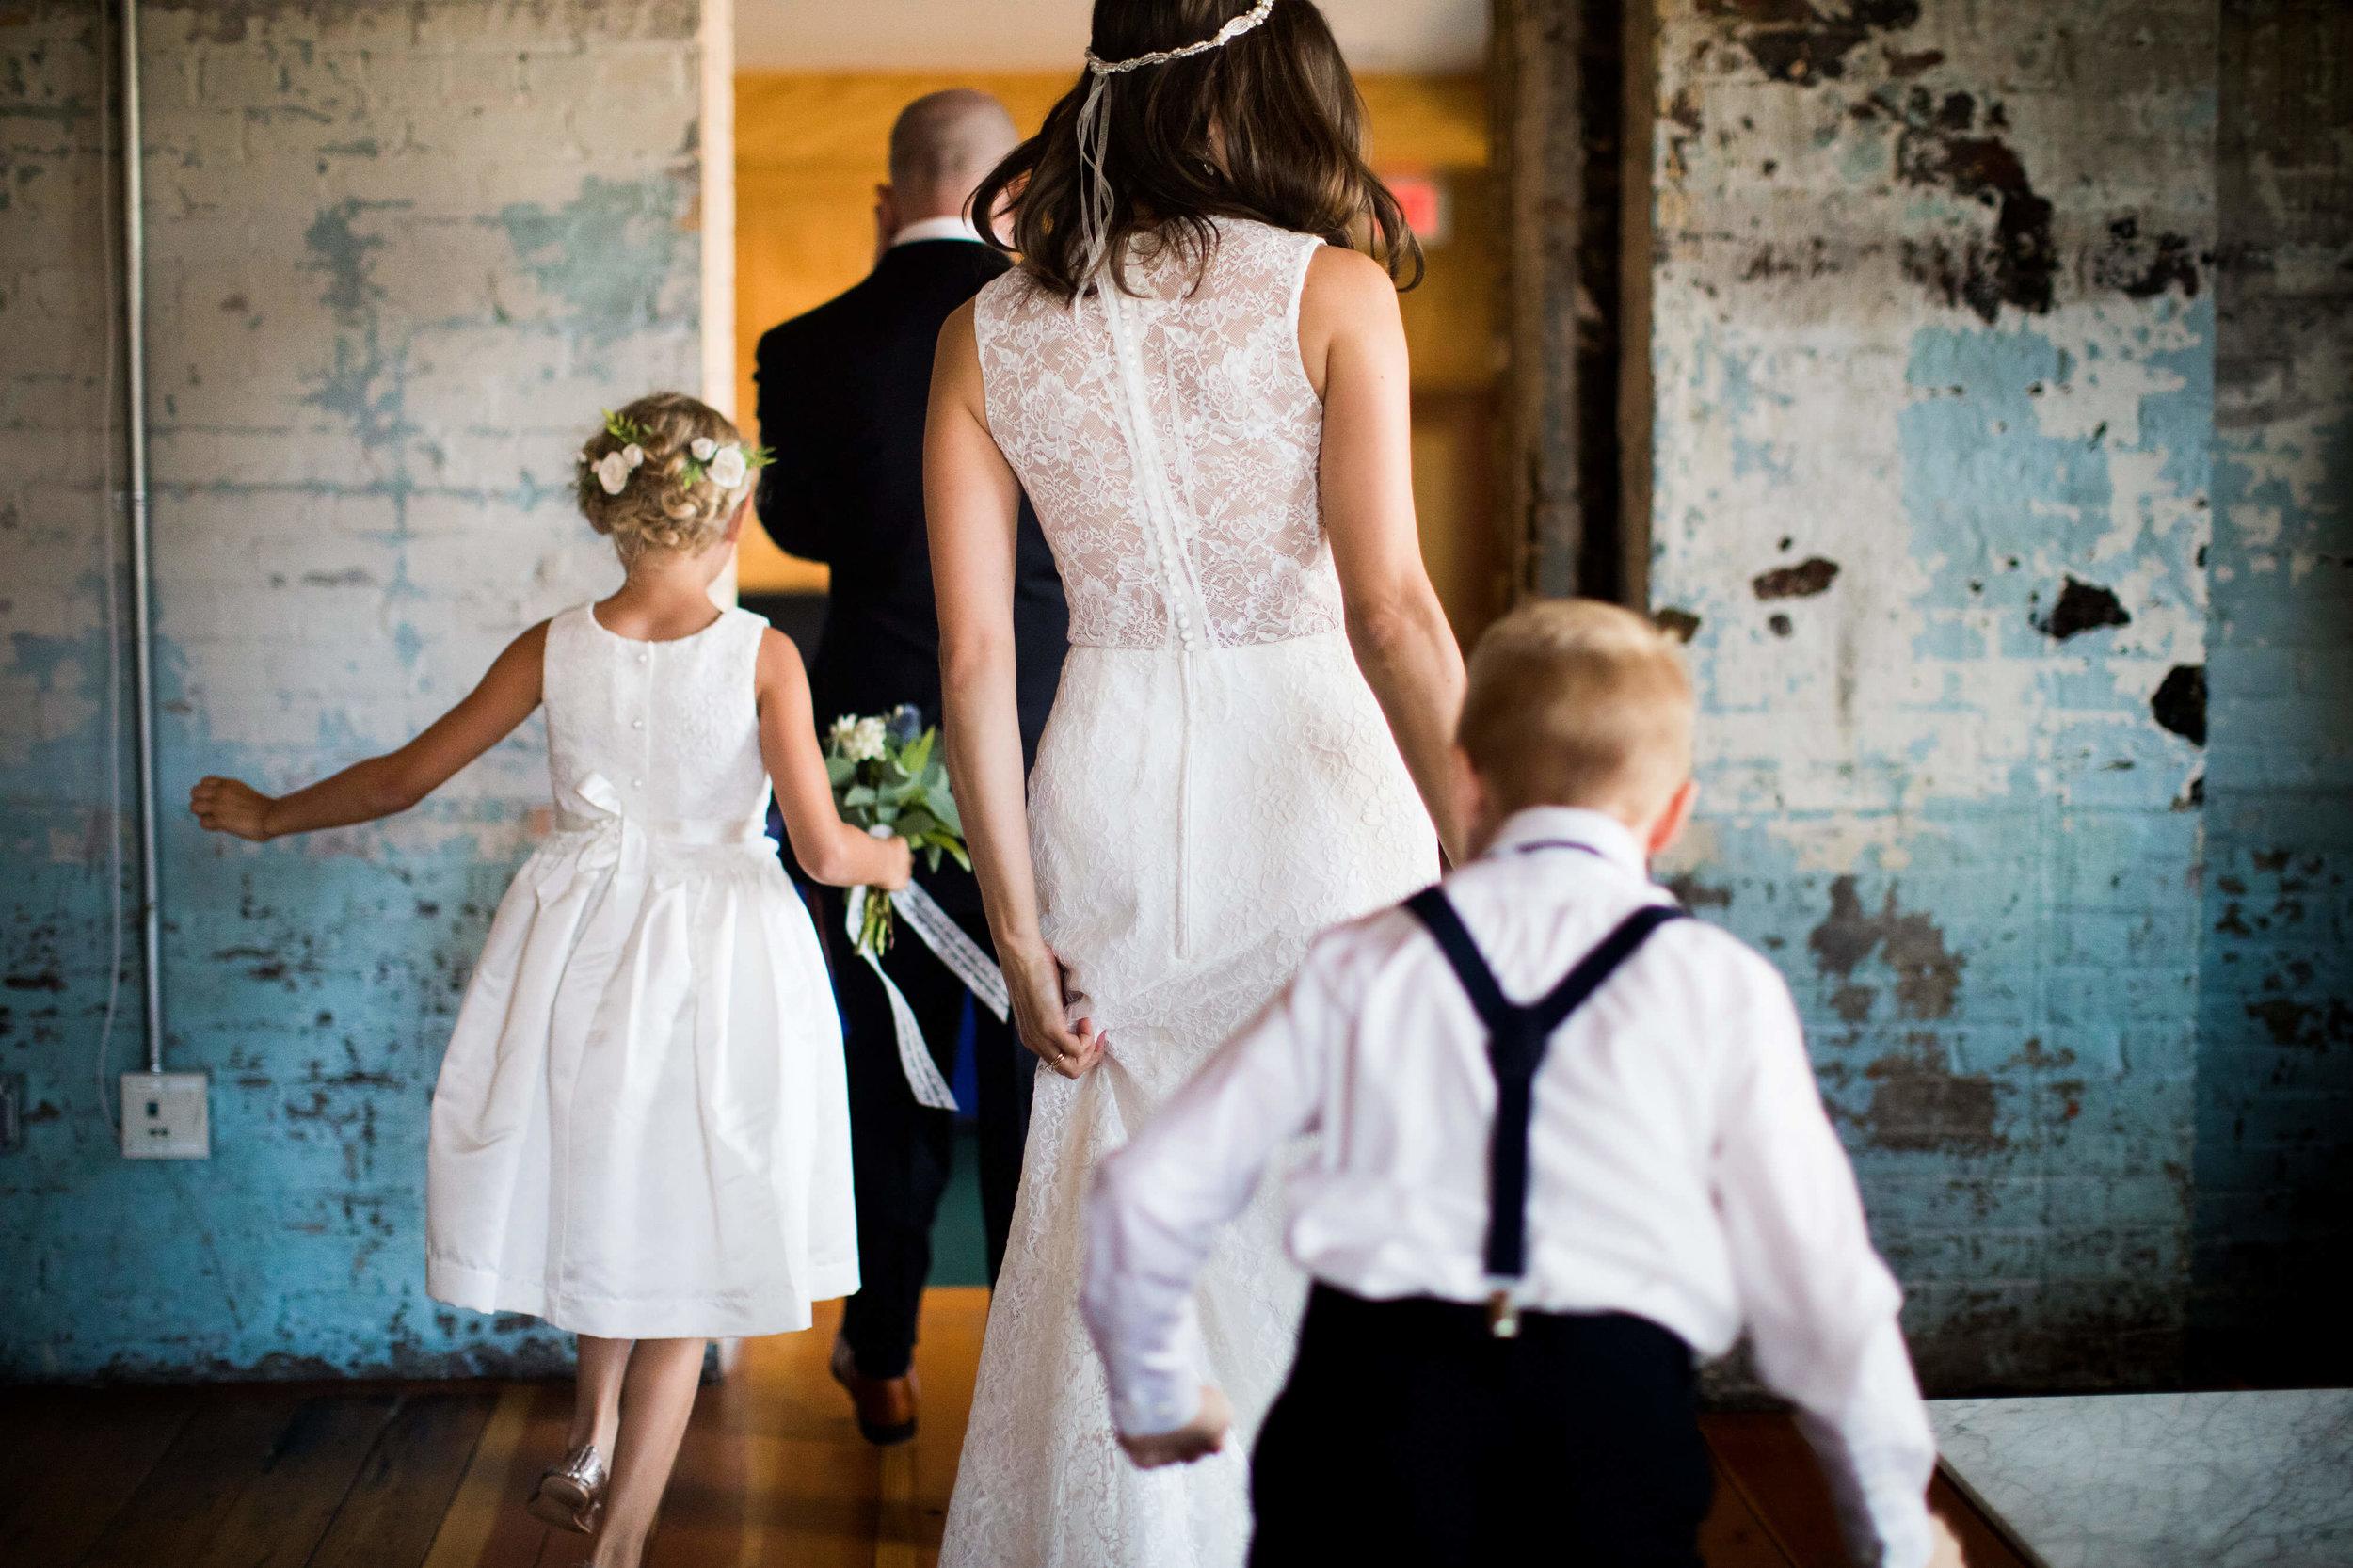 walking out for the wedding with ringbearer and flower girl | Minnesota wedding photographer Studio KH wedding dress details | wedding blog | Sixpence Events 70 Ways to Photograph Your Wedding Dress.jpg